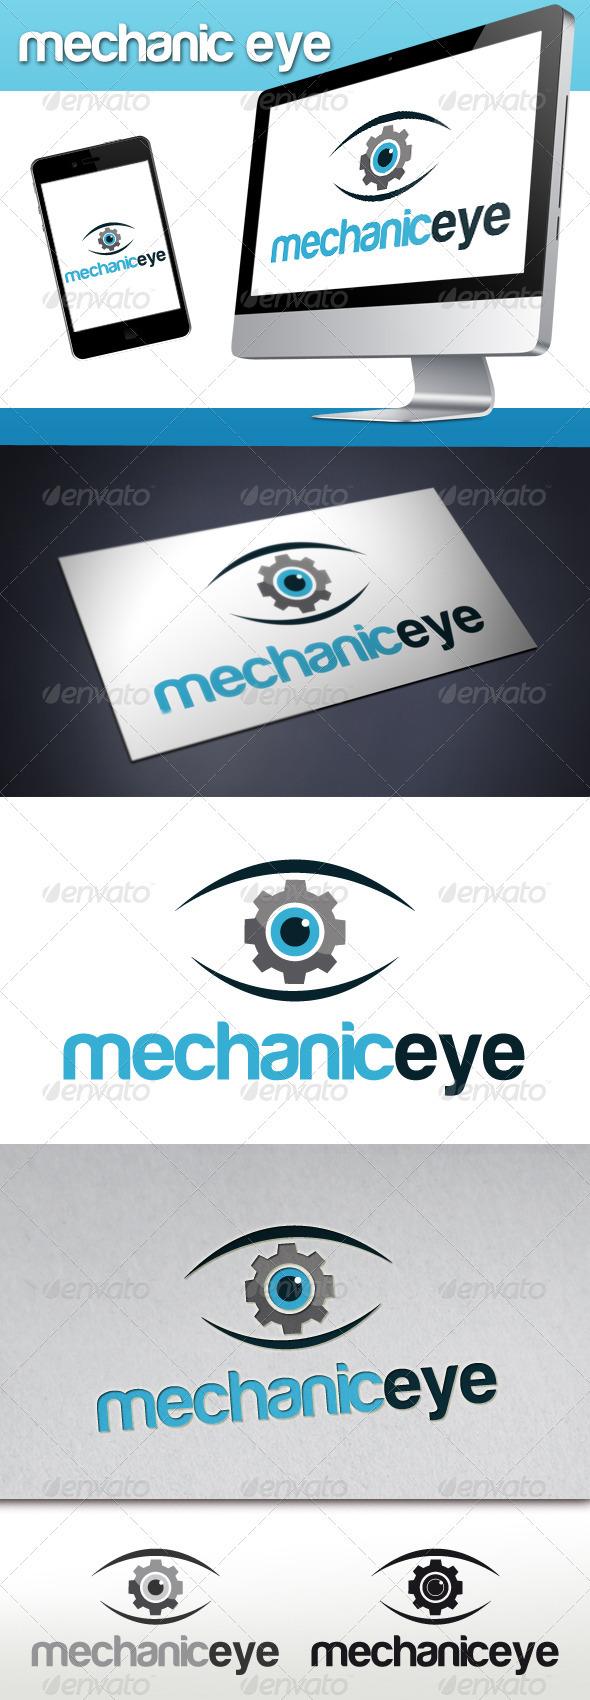 Mechanic Eye Logo